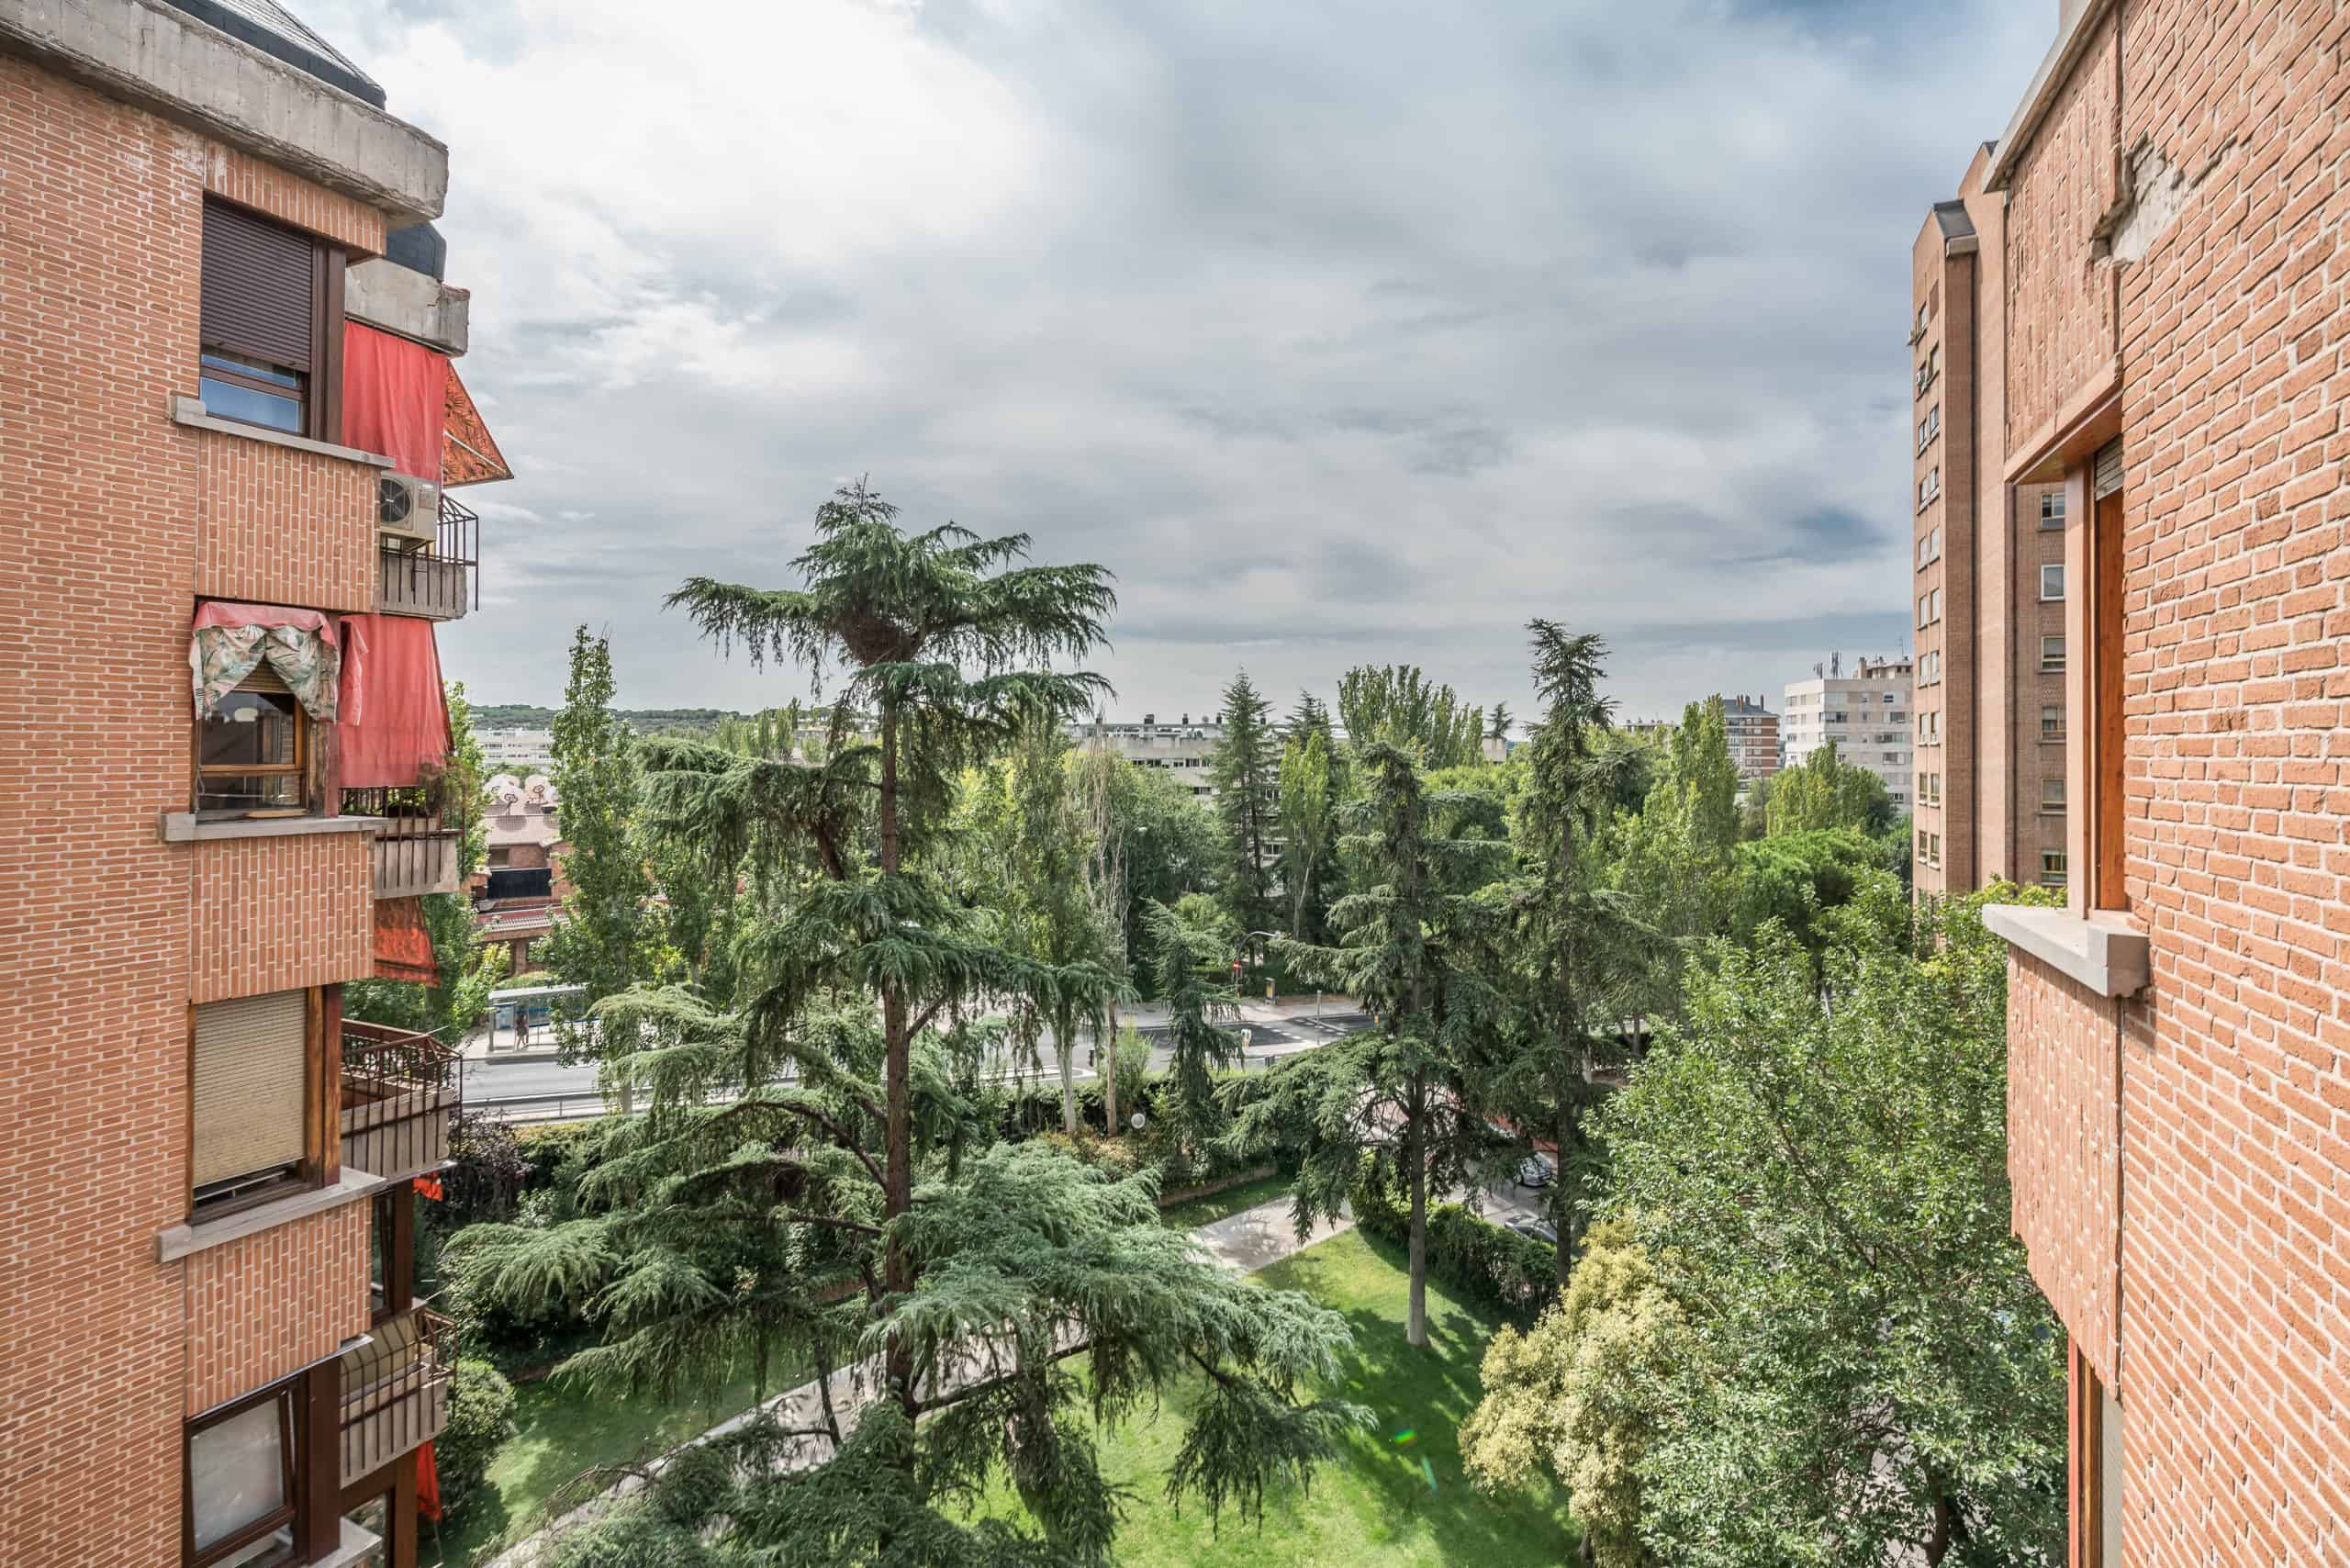 Agencia Inmobiliaria de Madrid-FUTUROCASA-Zona ARGANZUELA-EMBAJADORES-LEGAZPI -calle Embajadores- baño 162